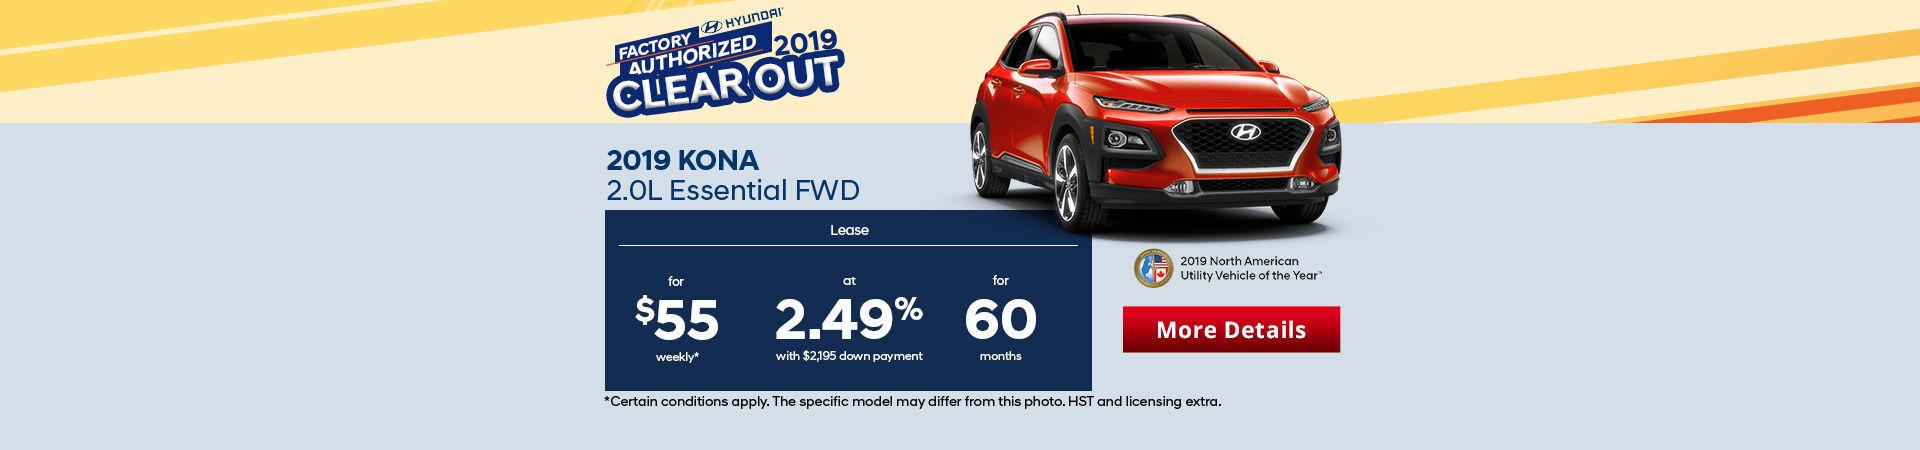 Lease the 2019 Hyundai KONA